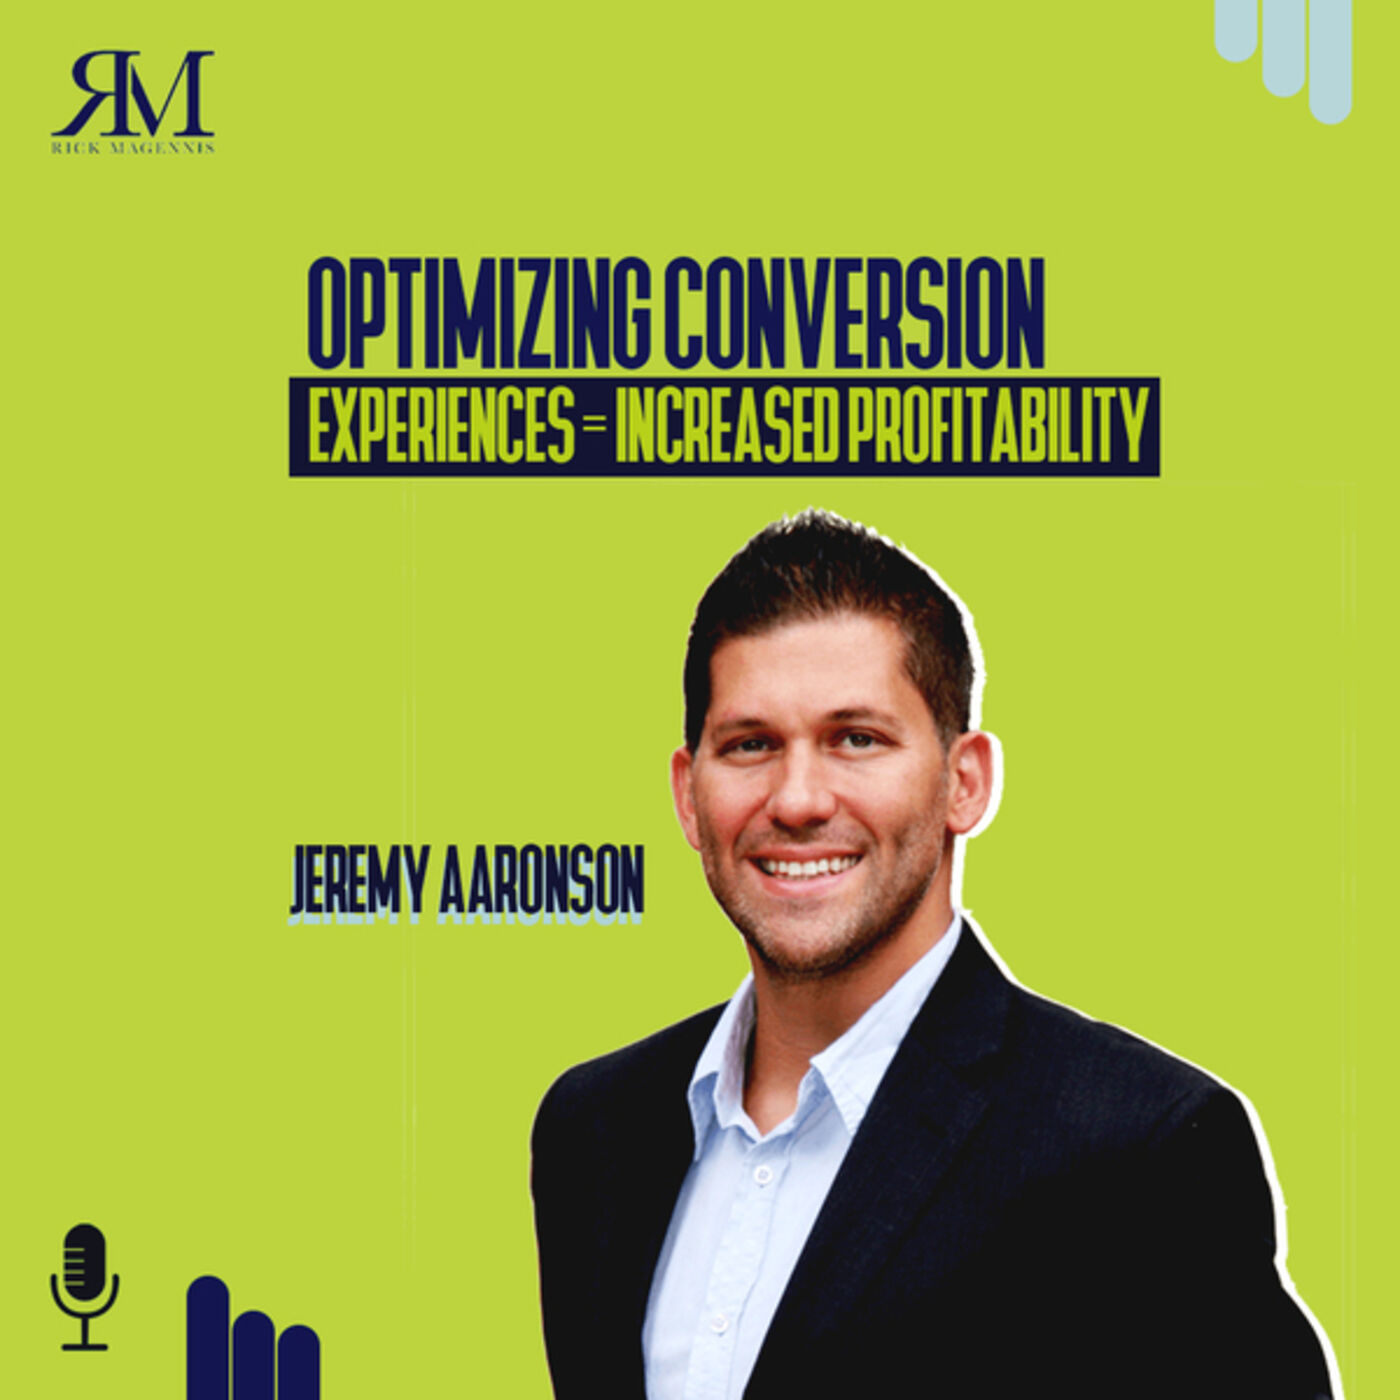 Optimizing Conversion - Experiences = Increased Profitability